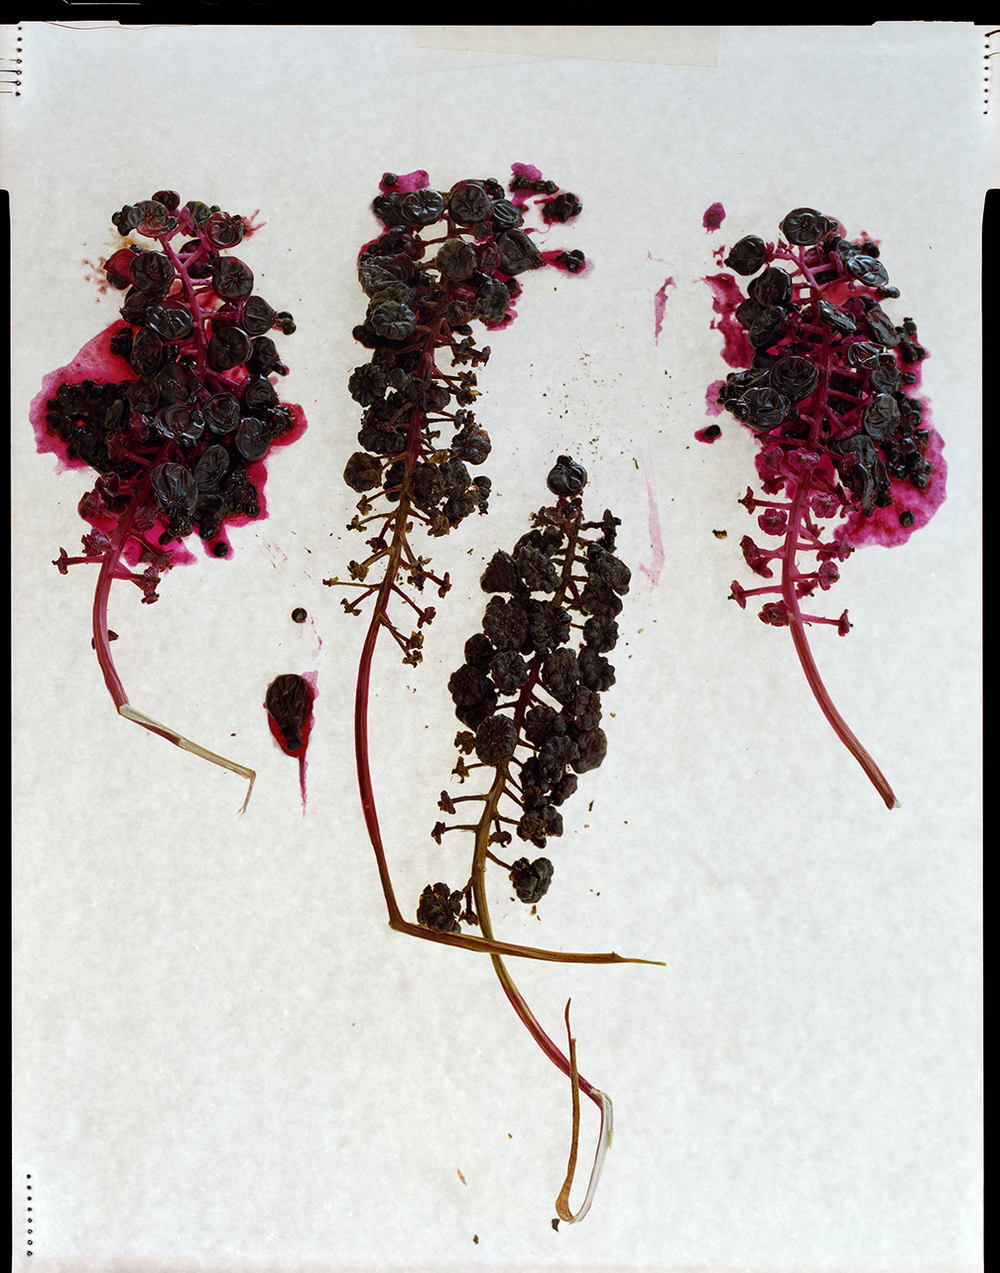 Berries (2013)